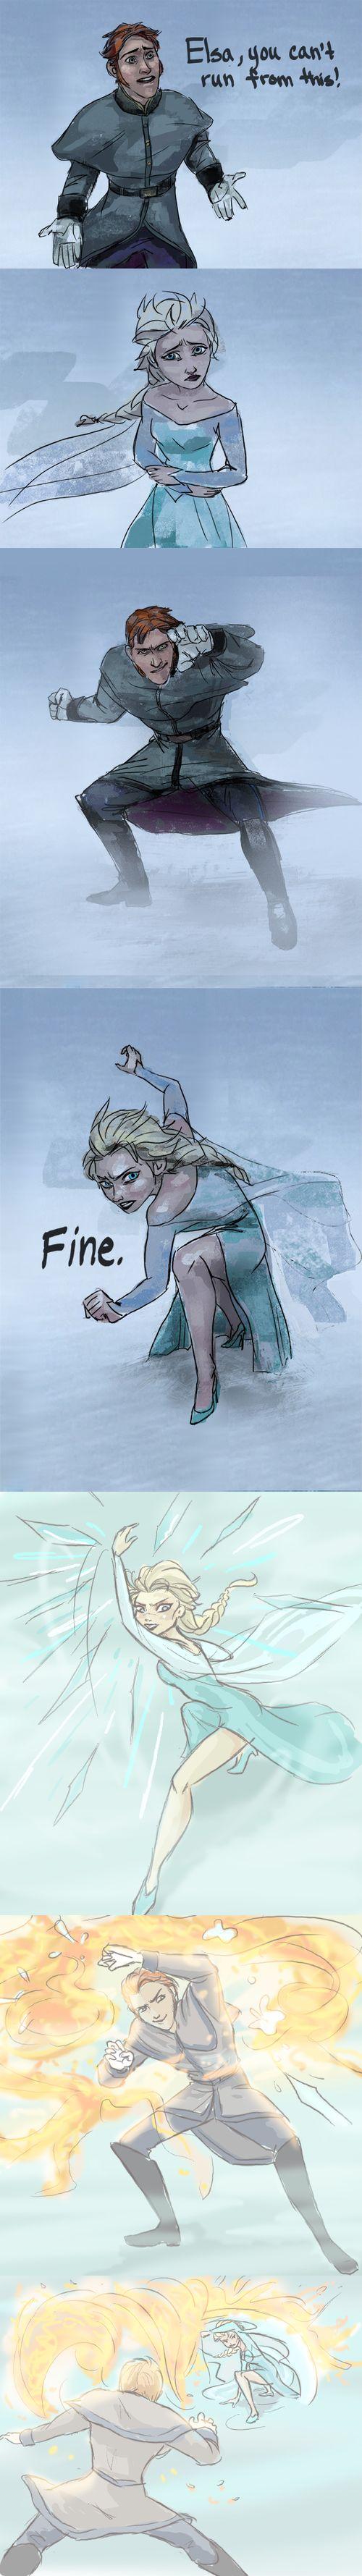 If Hans had fire power